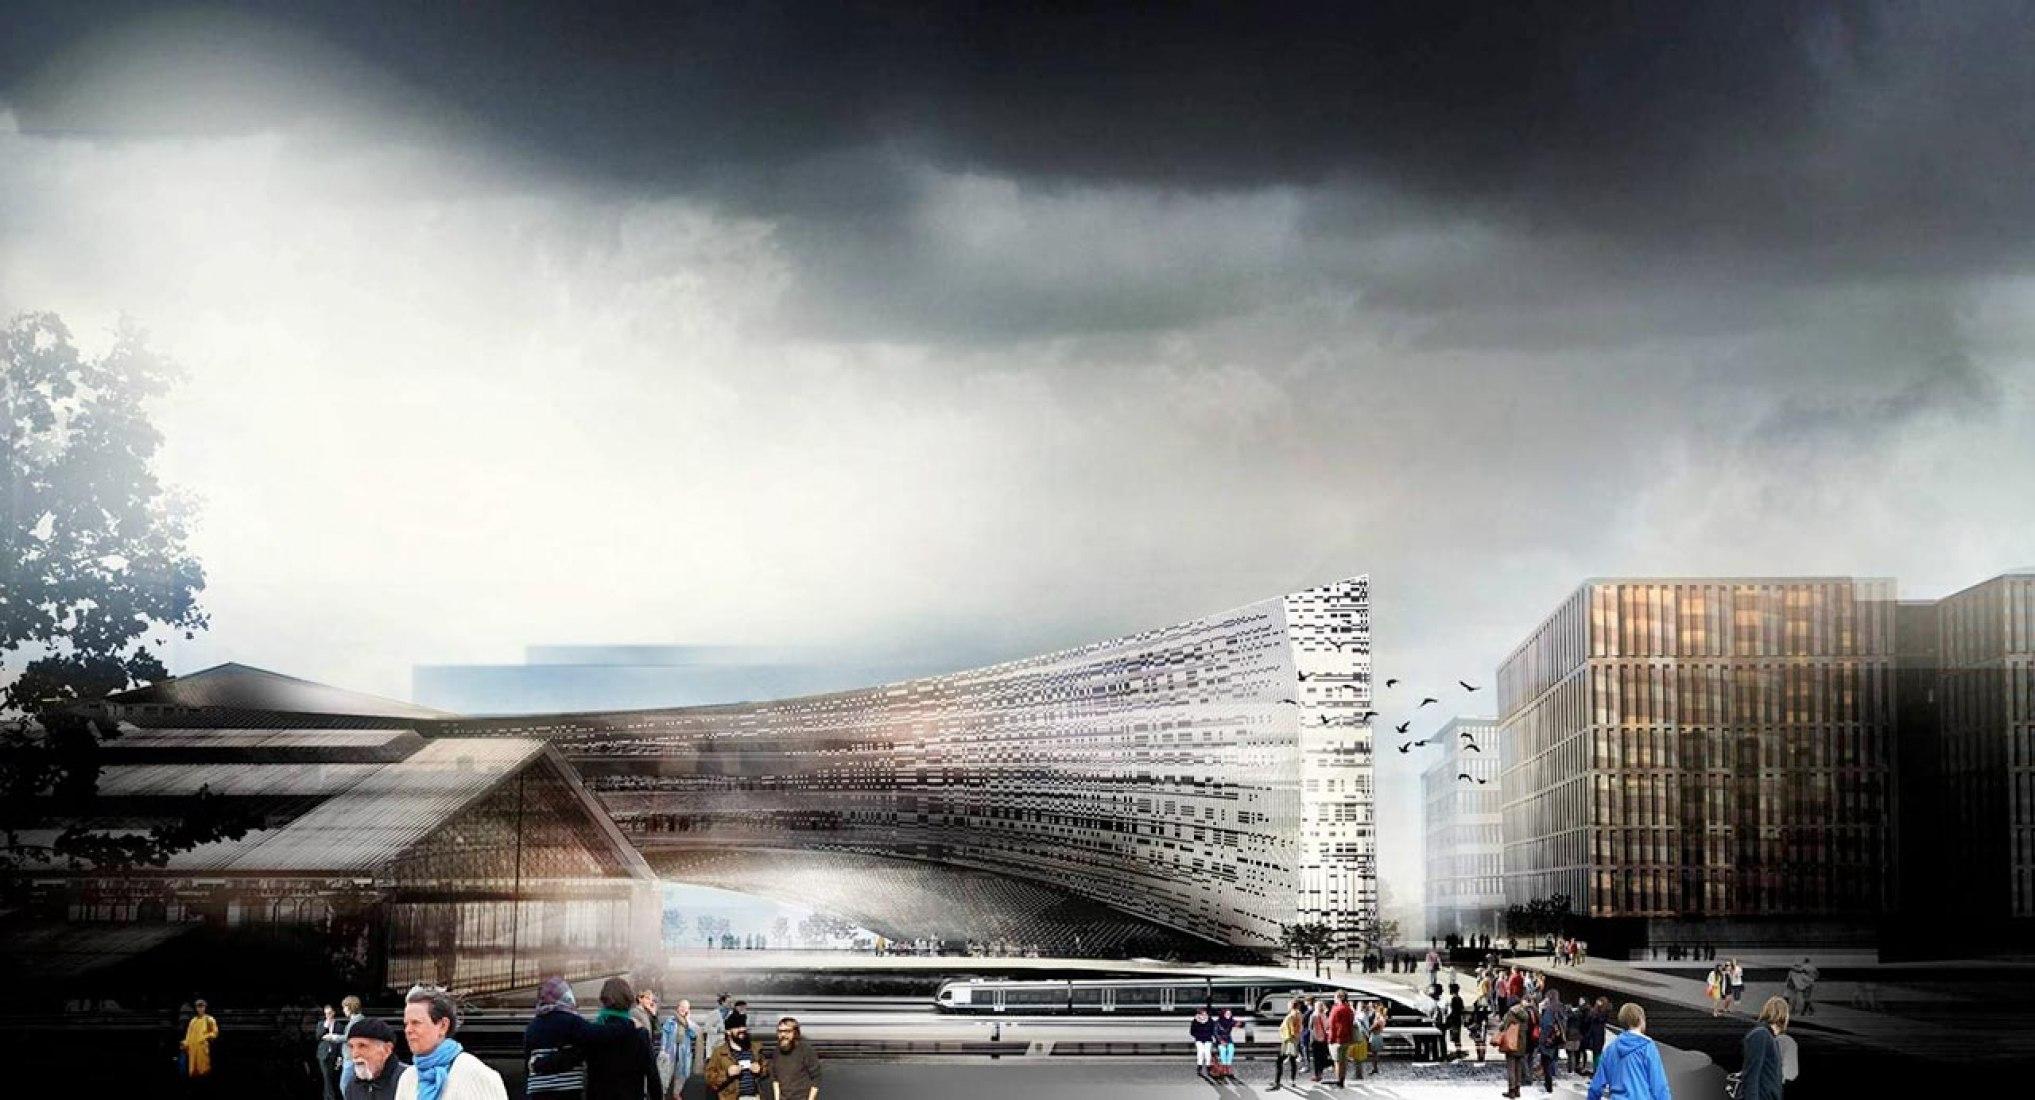 New Le Monde Headquarters by Snøhetta